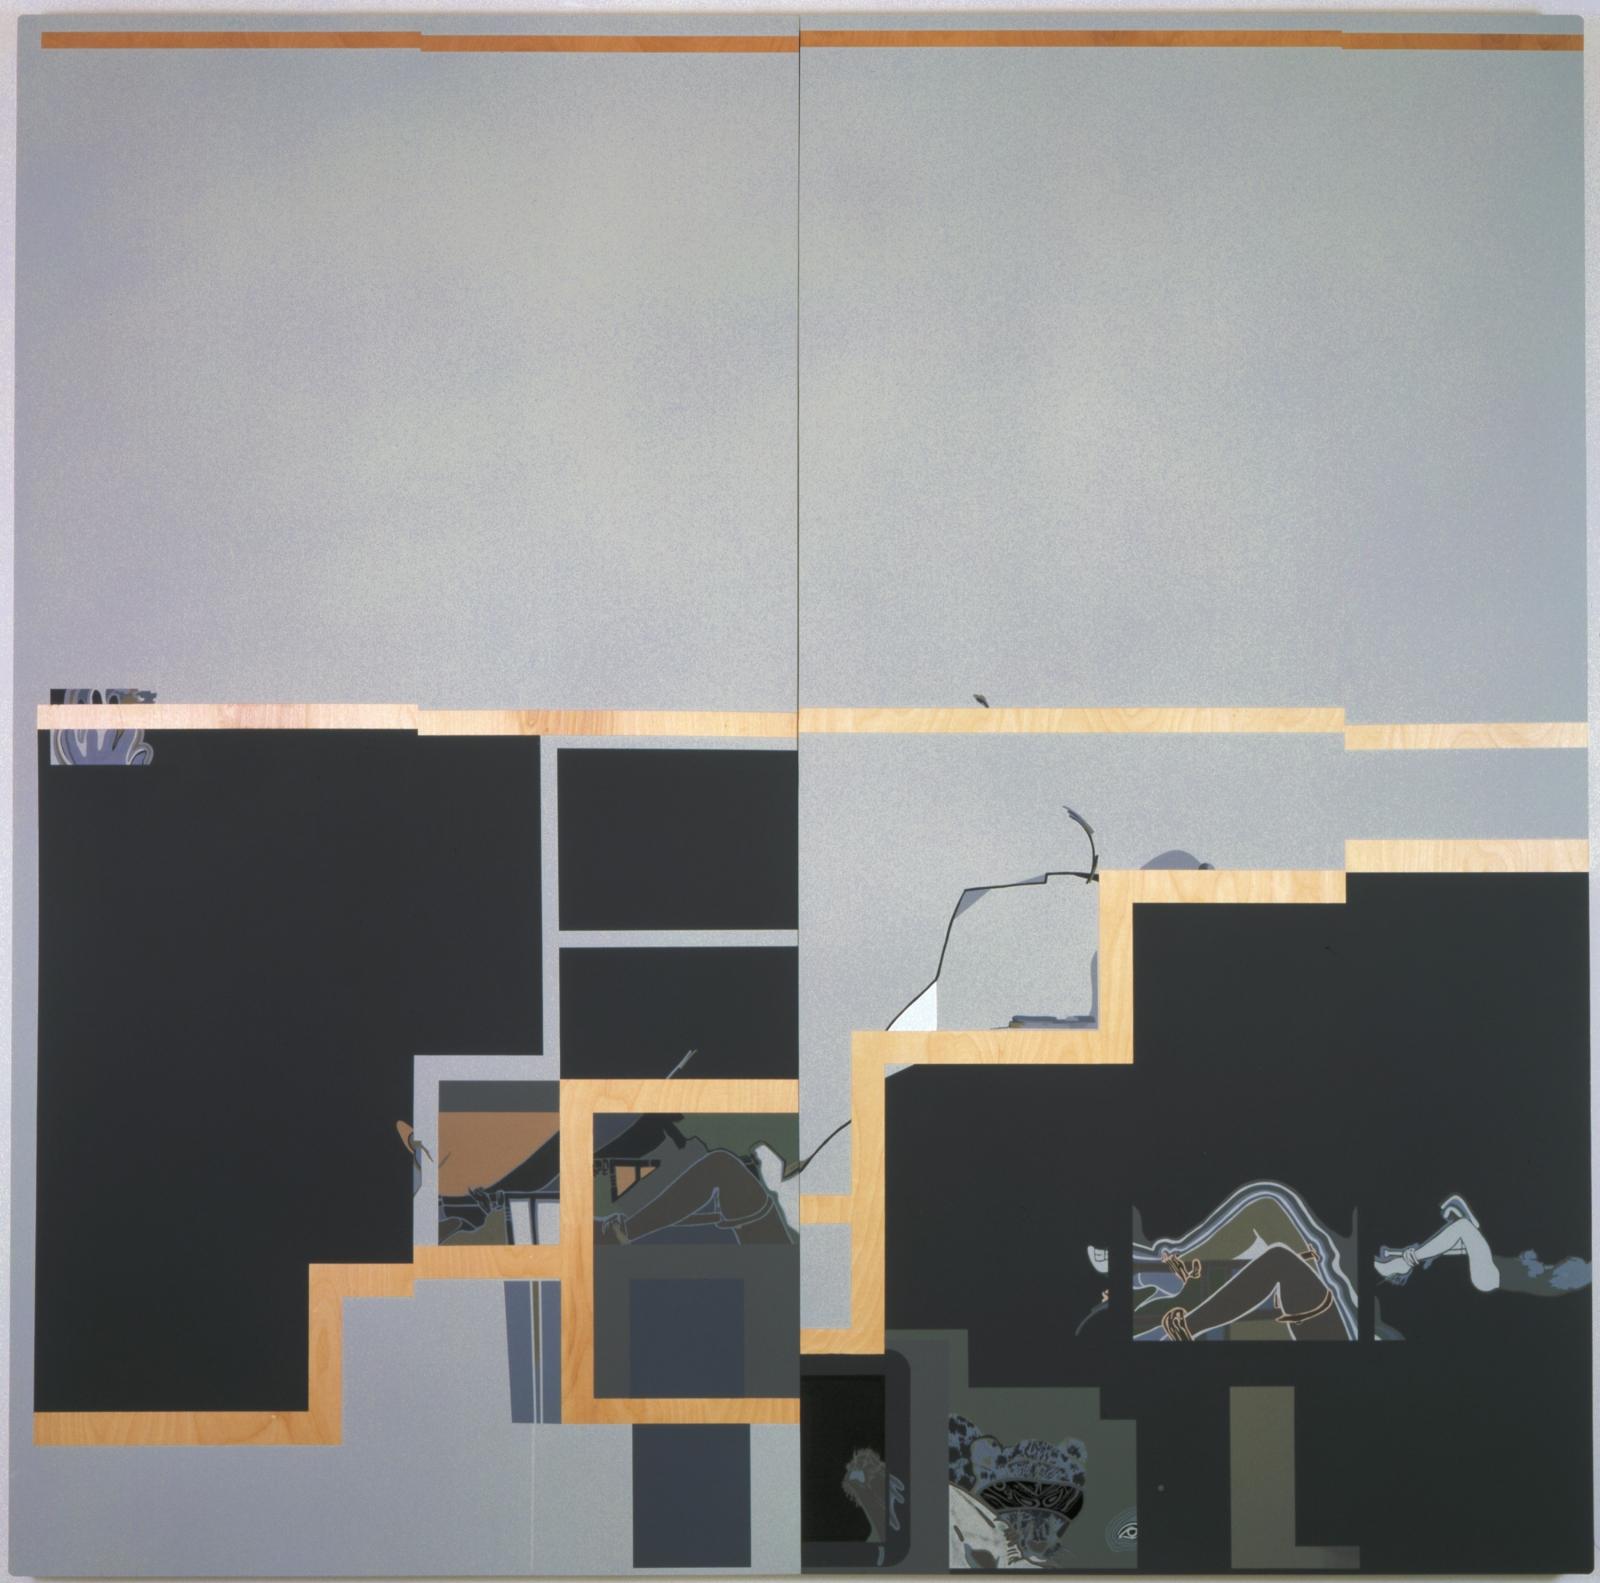 CASEY COOK, Brenda Abbandandola (The return of Grace), 2000